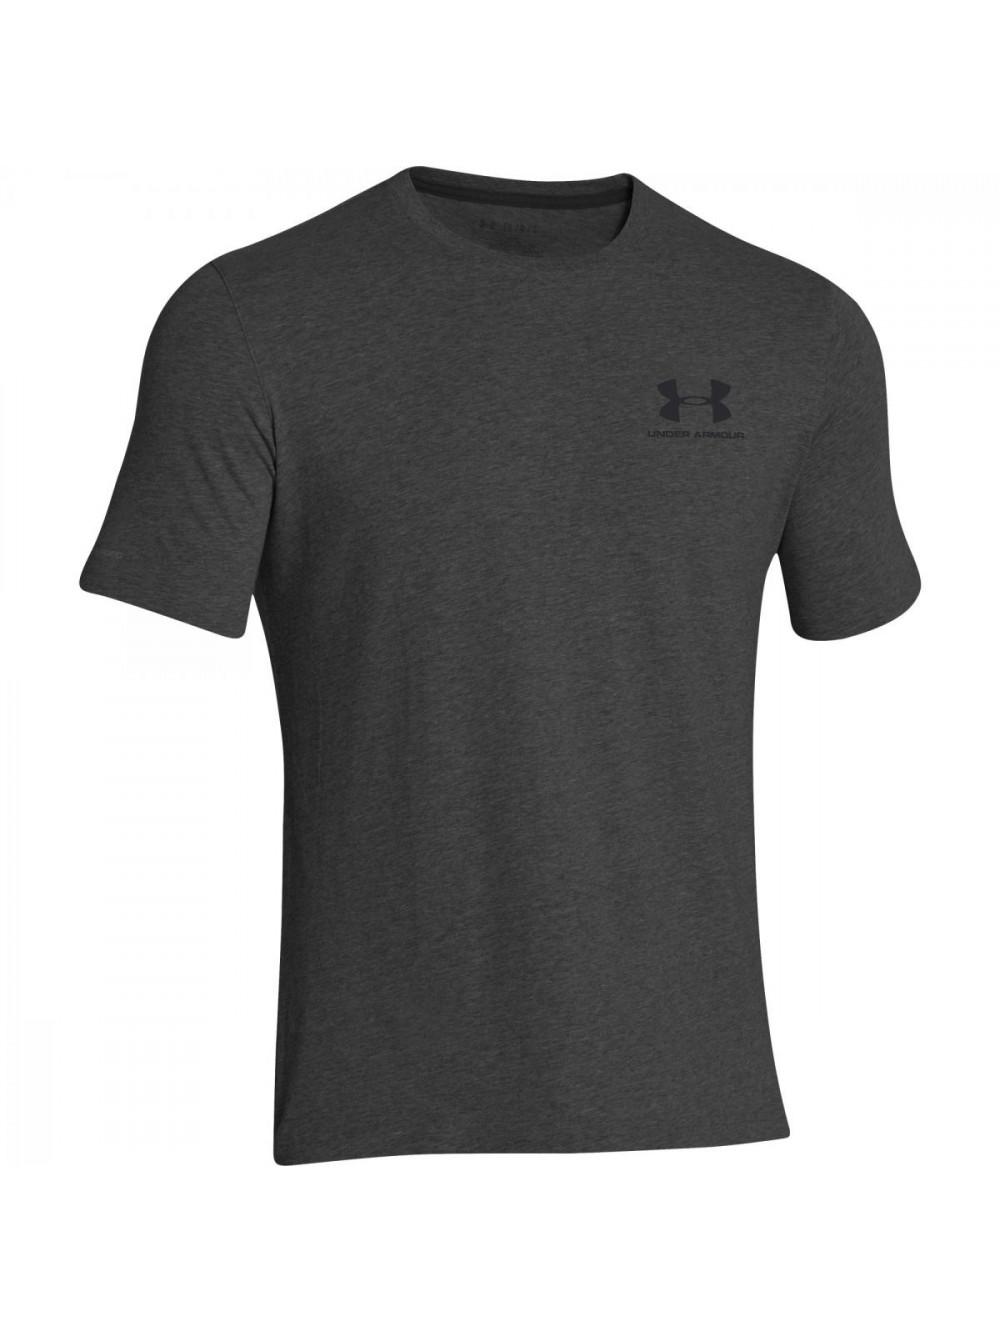 Herren lockeres T-Shirt Under Armour Left Chest Logo Tee grau